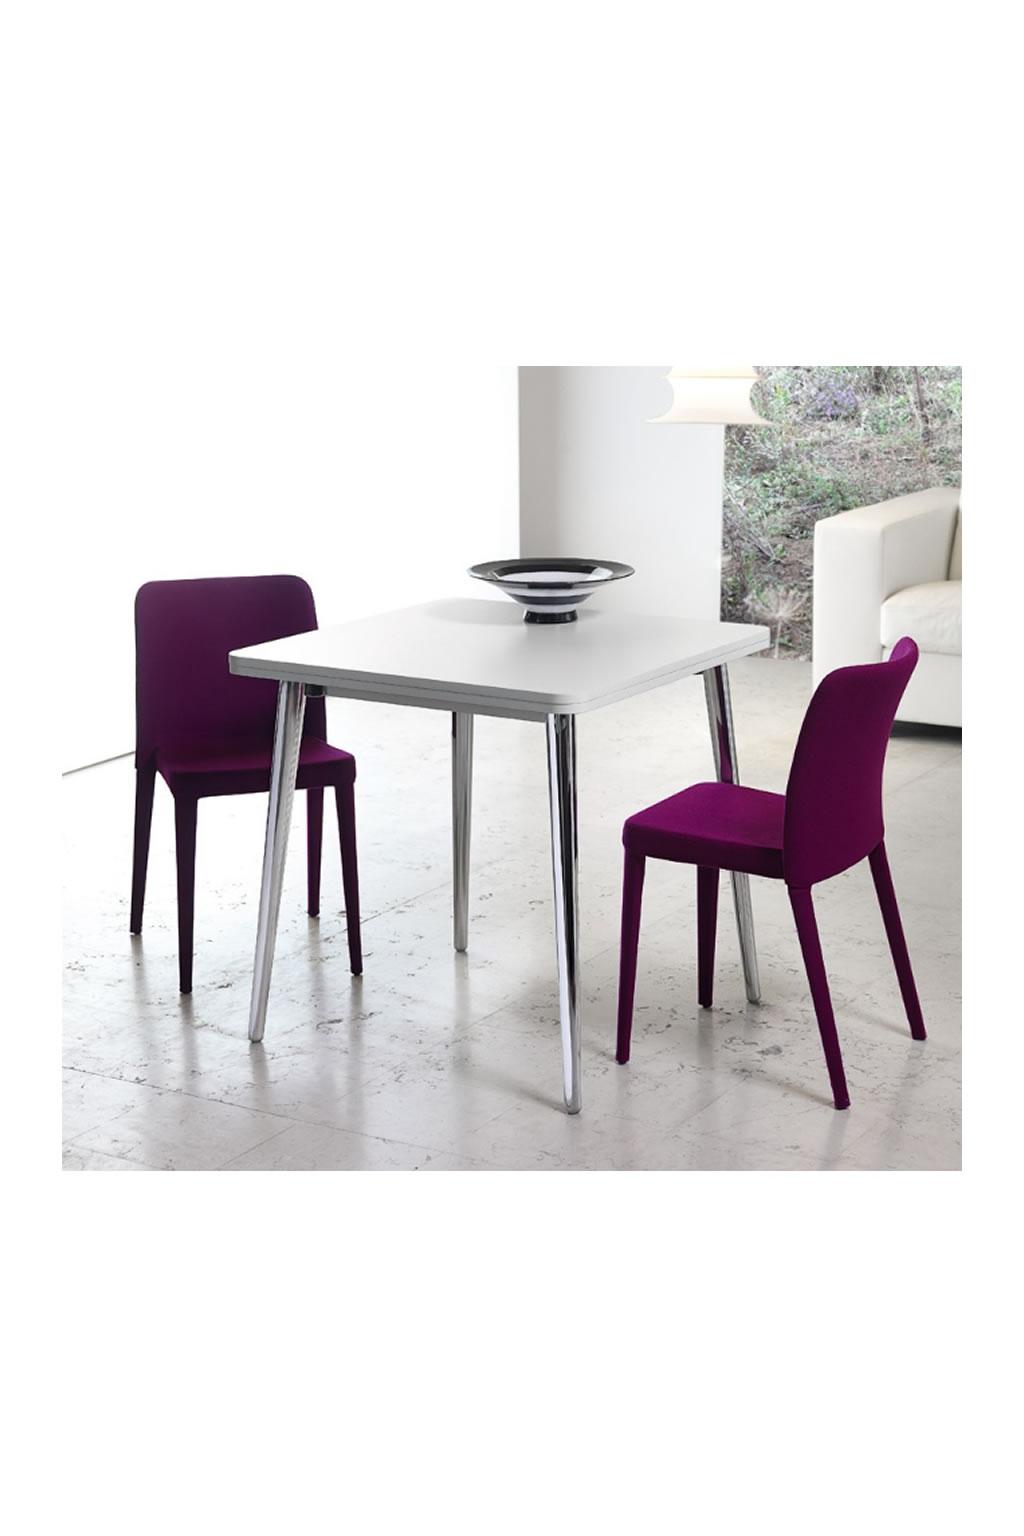 Tavoli e tavolini per la casa